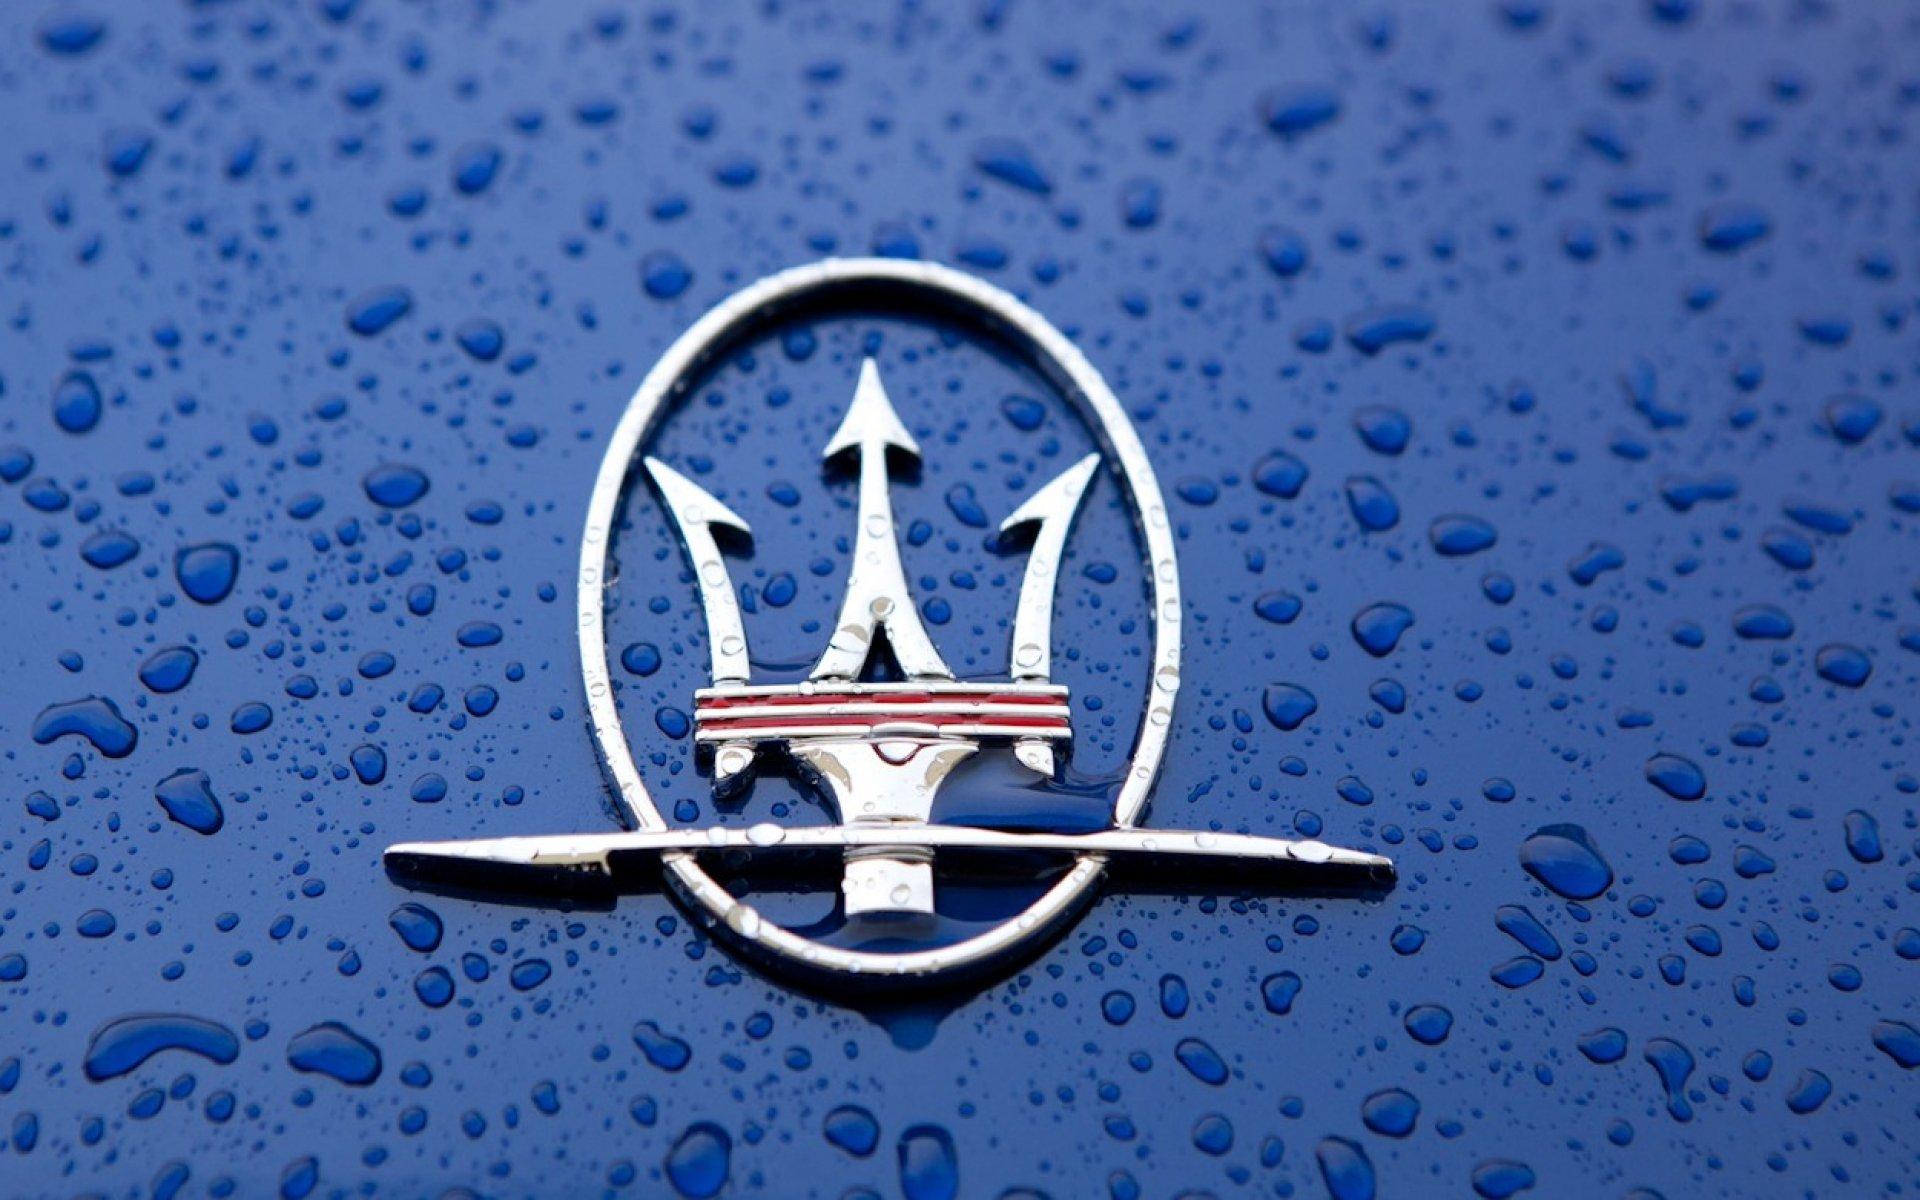 Maserati Car Logo Wallpaper Photos 59089 1920x1200px 1920x1200